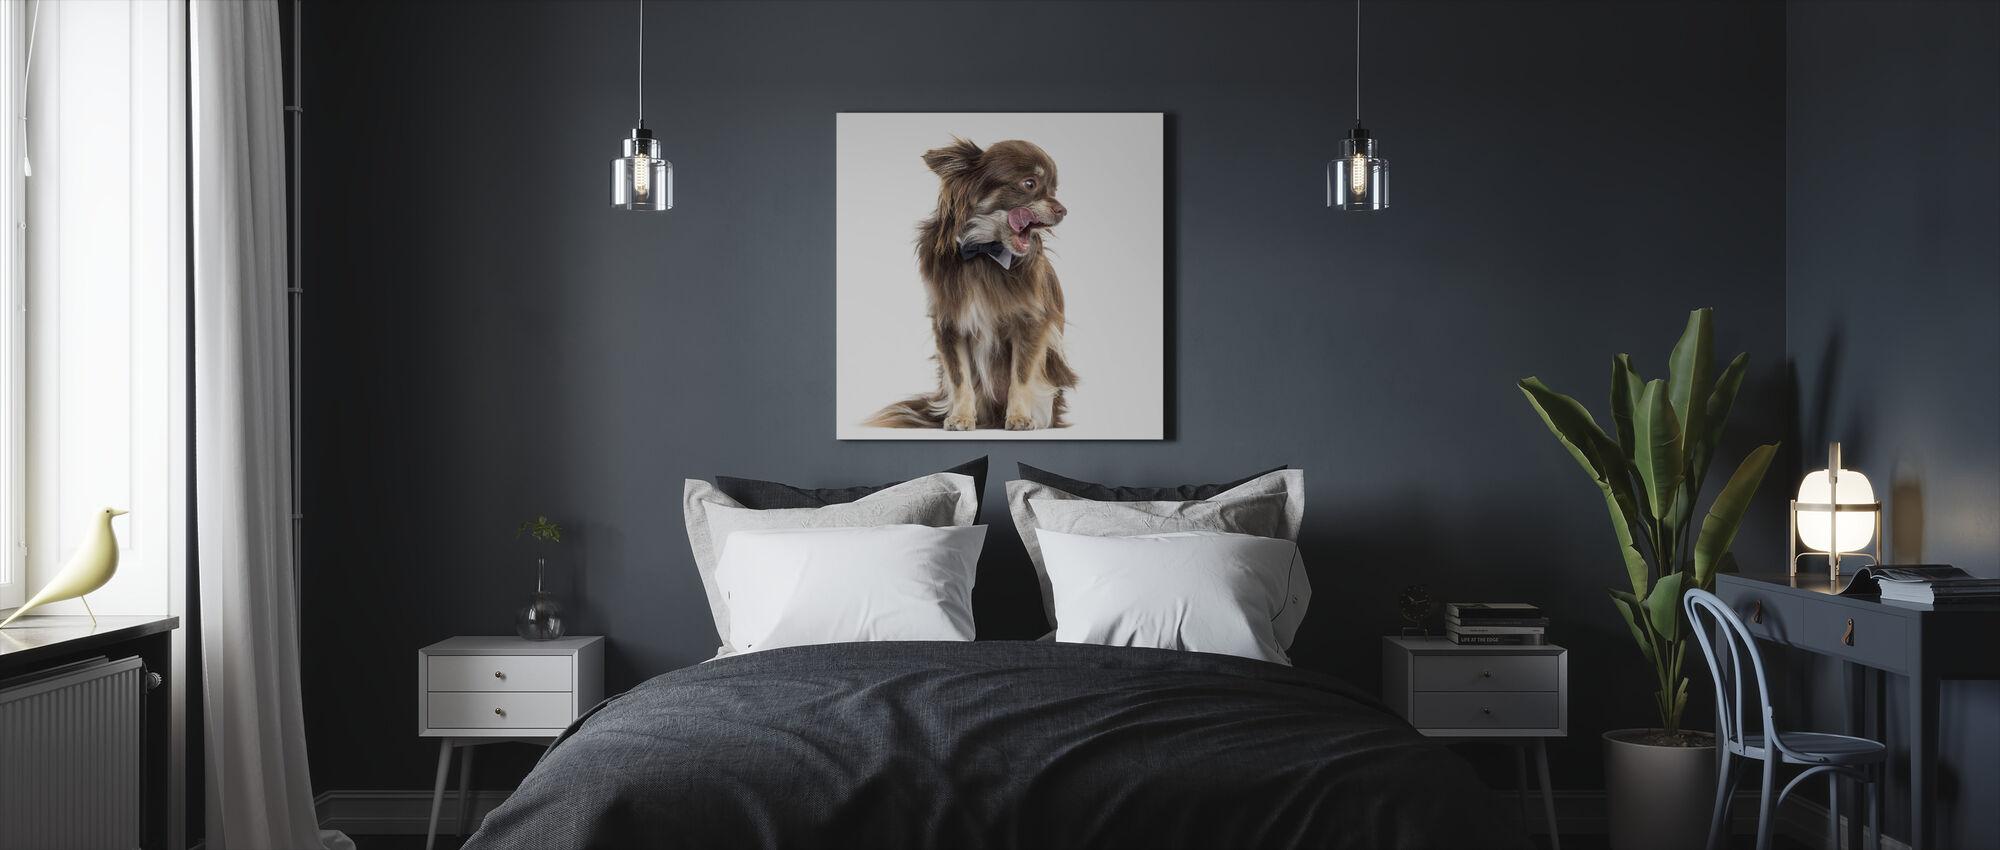 Chihuahua - Canvas print - Bedroom